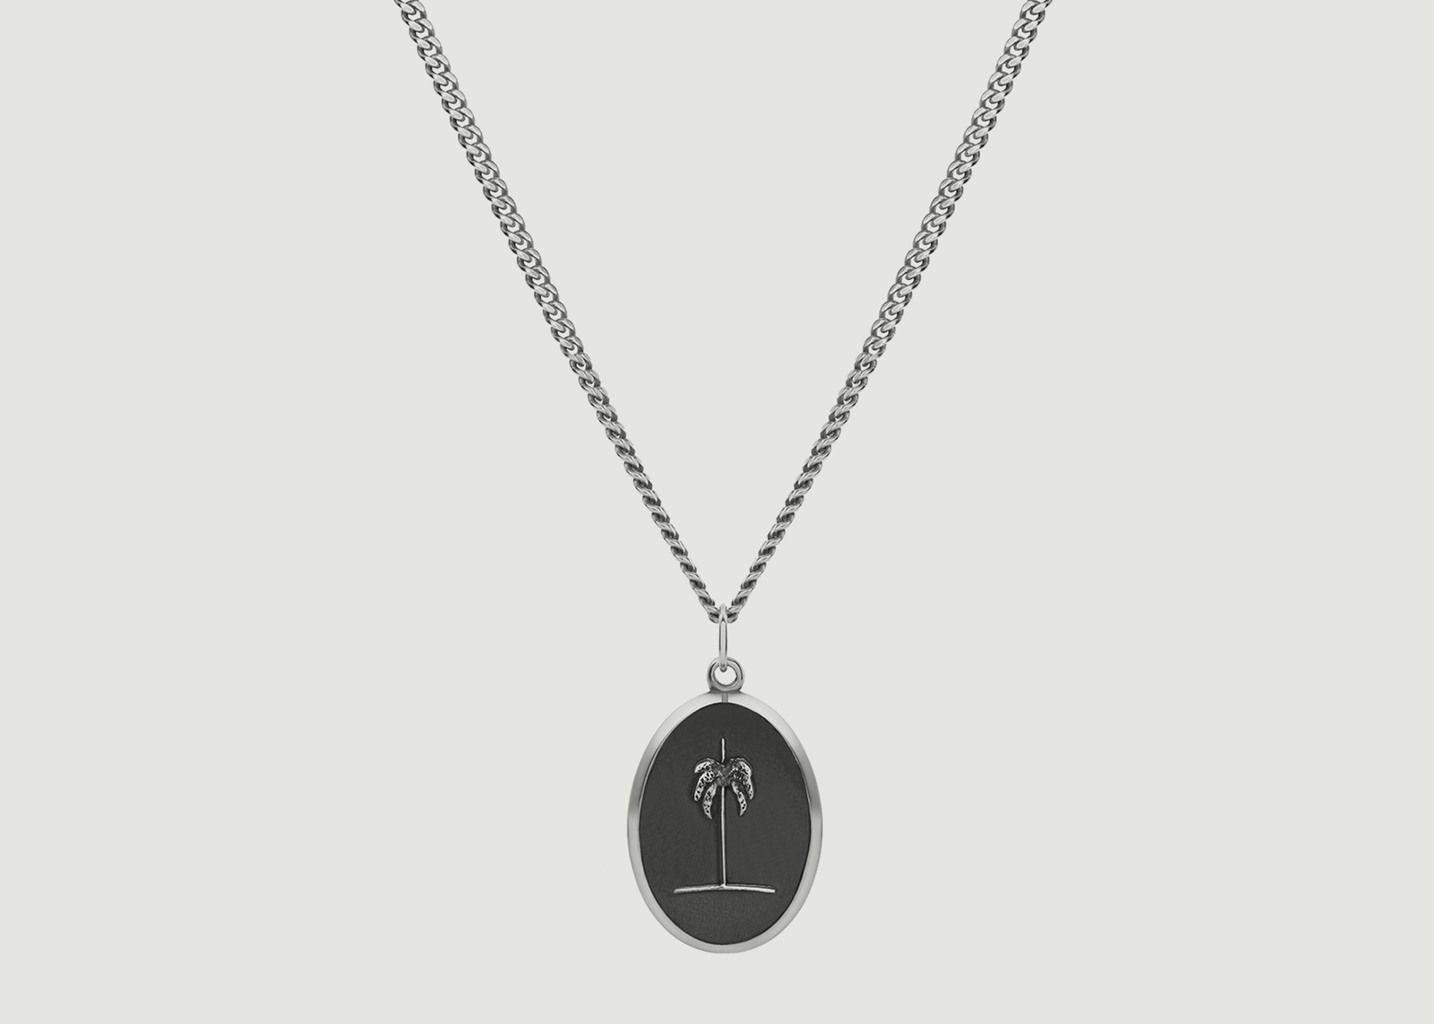 Collier Palm Tree - Miansai